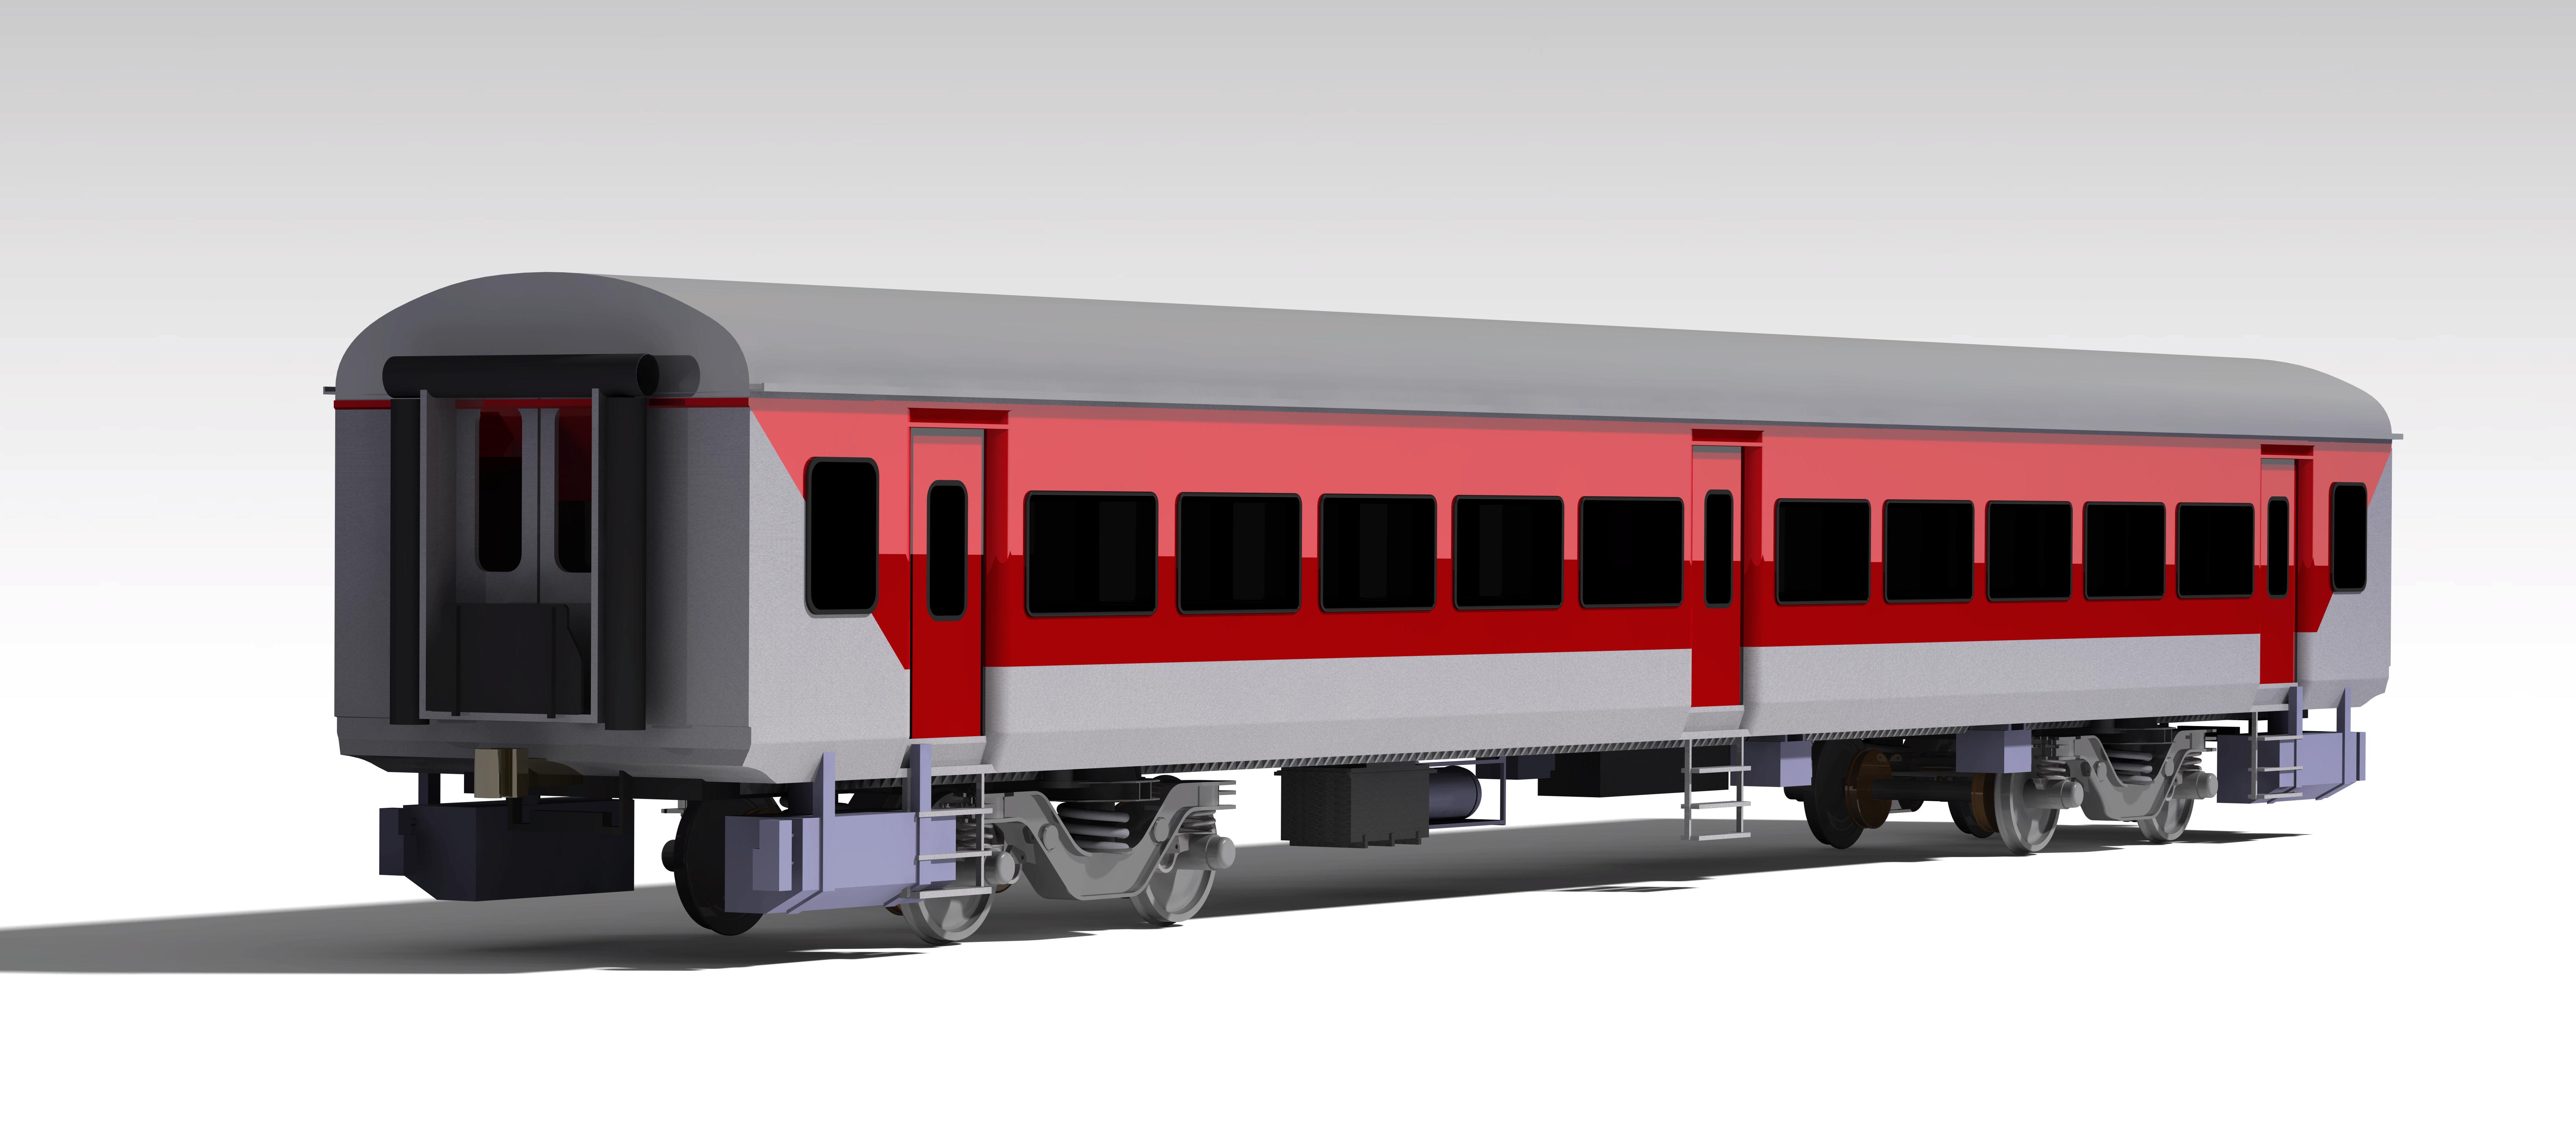 lhb coach火车机车模型3D图纸 STP格式